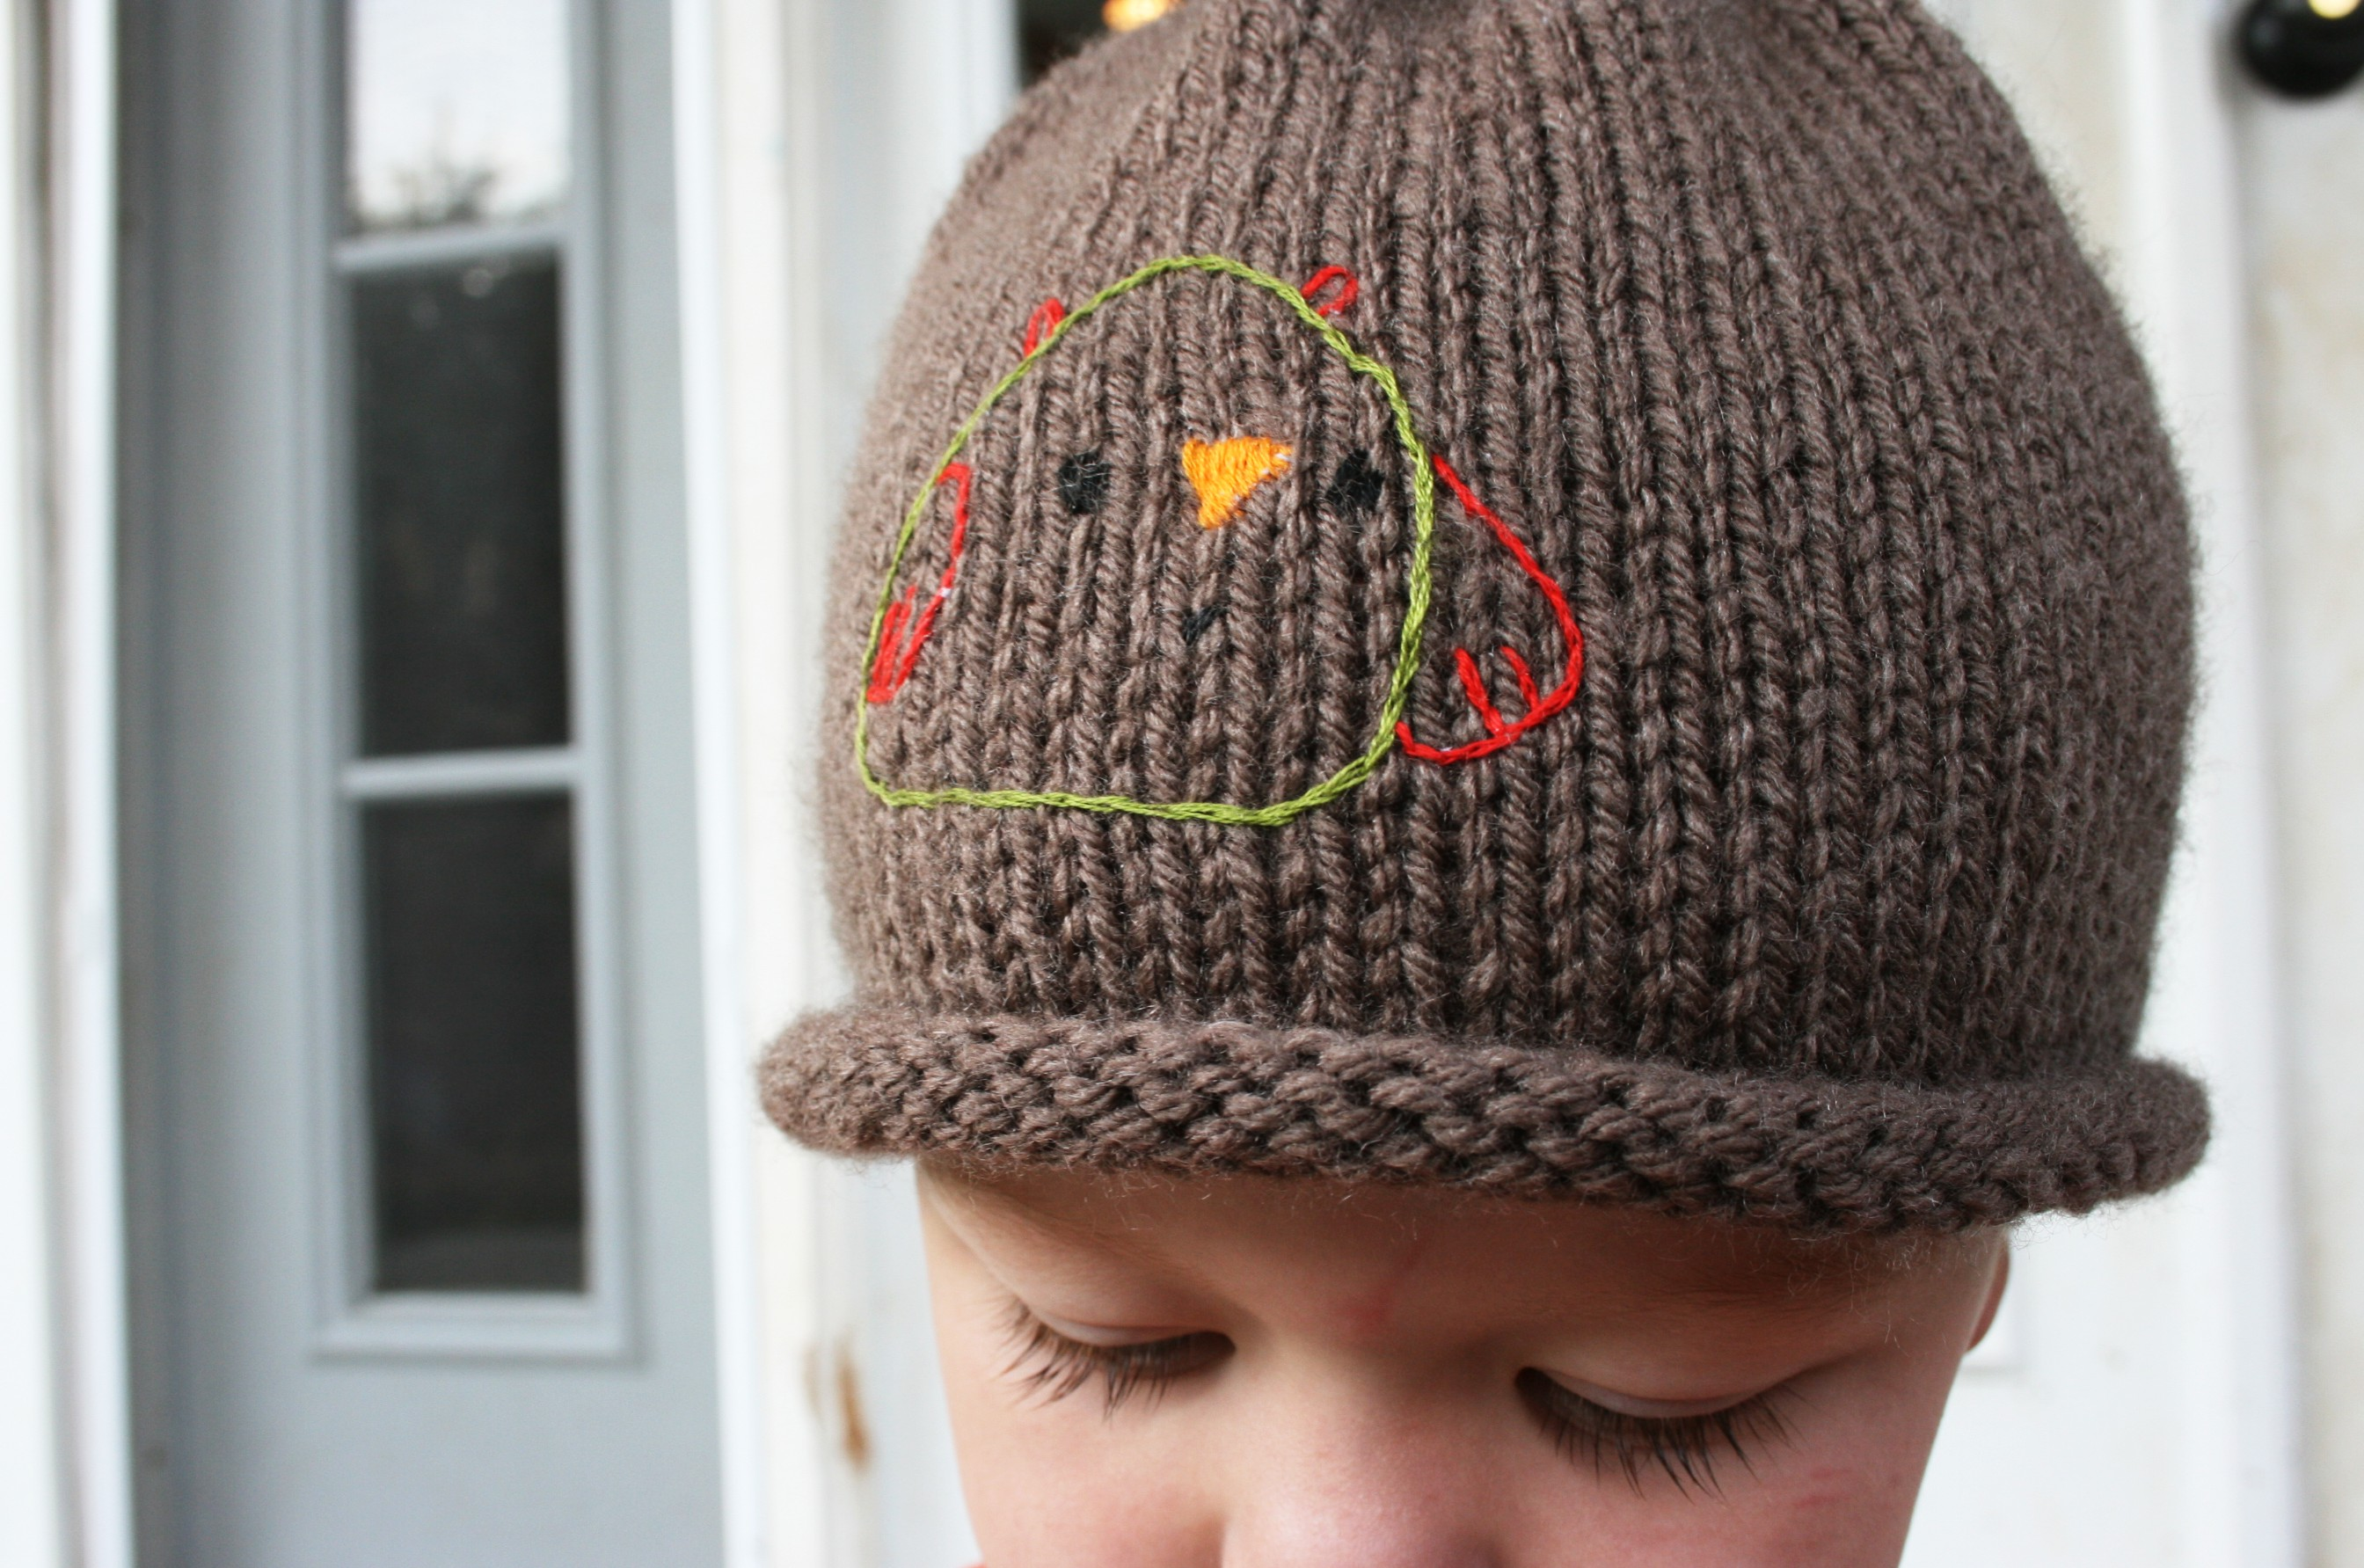 Pimp Stitch Embroidery On Knitting : Pimp Stitch : Tutorial Monday :: Embroidery On Knitting